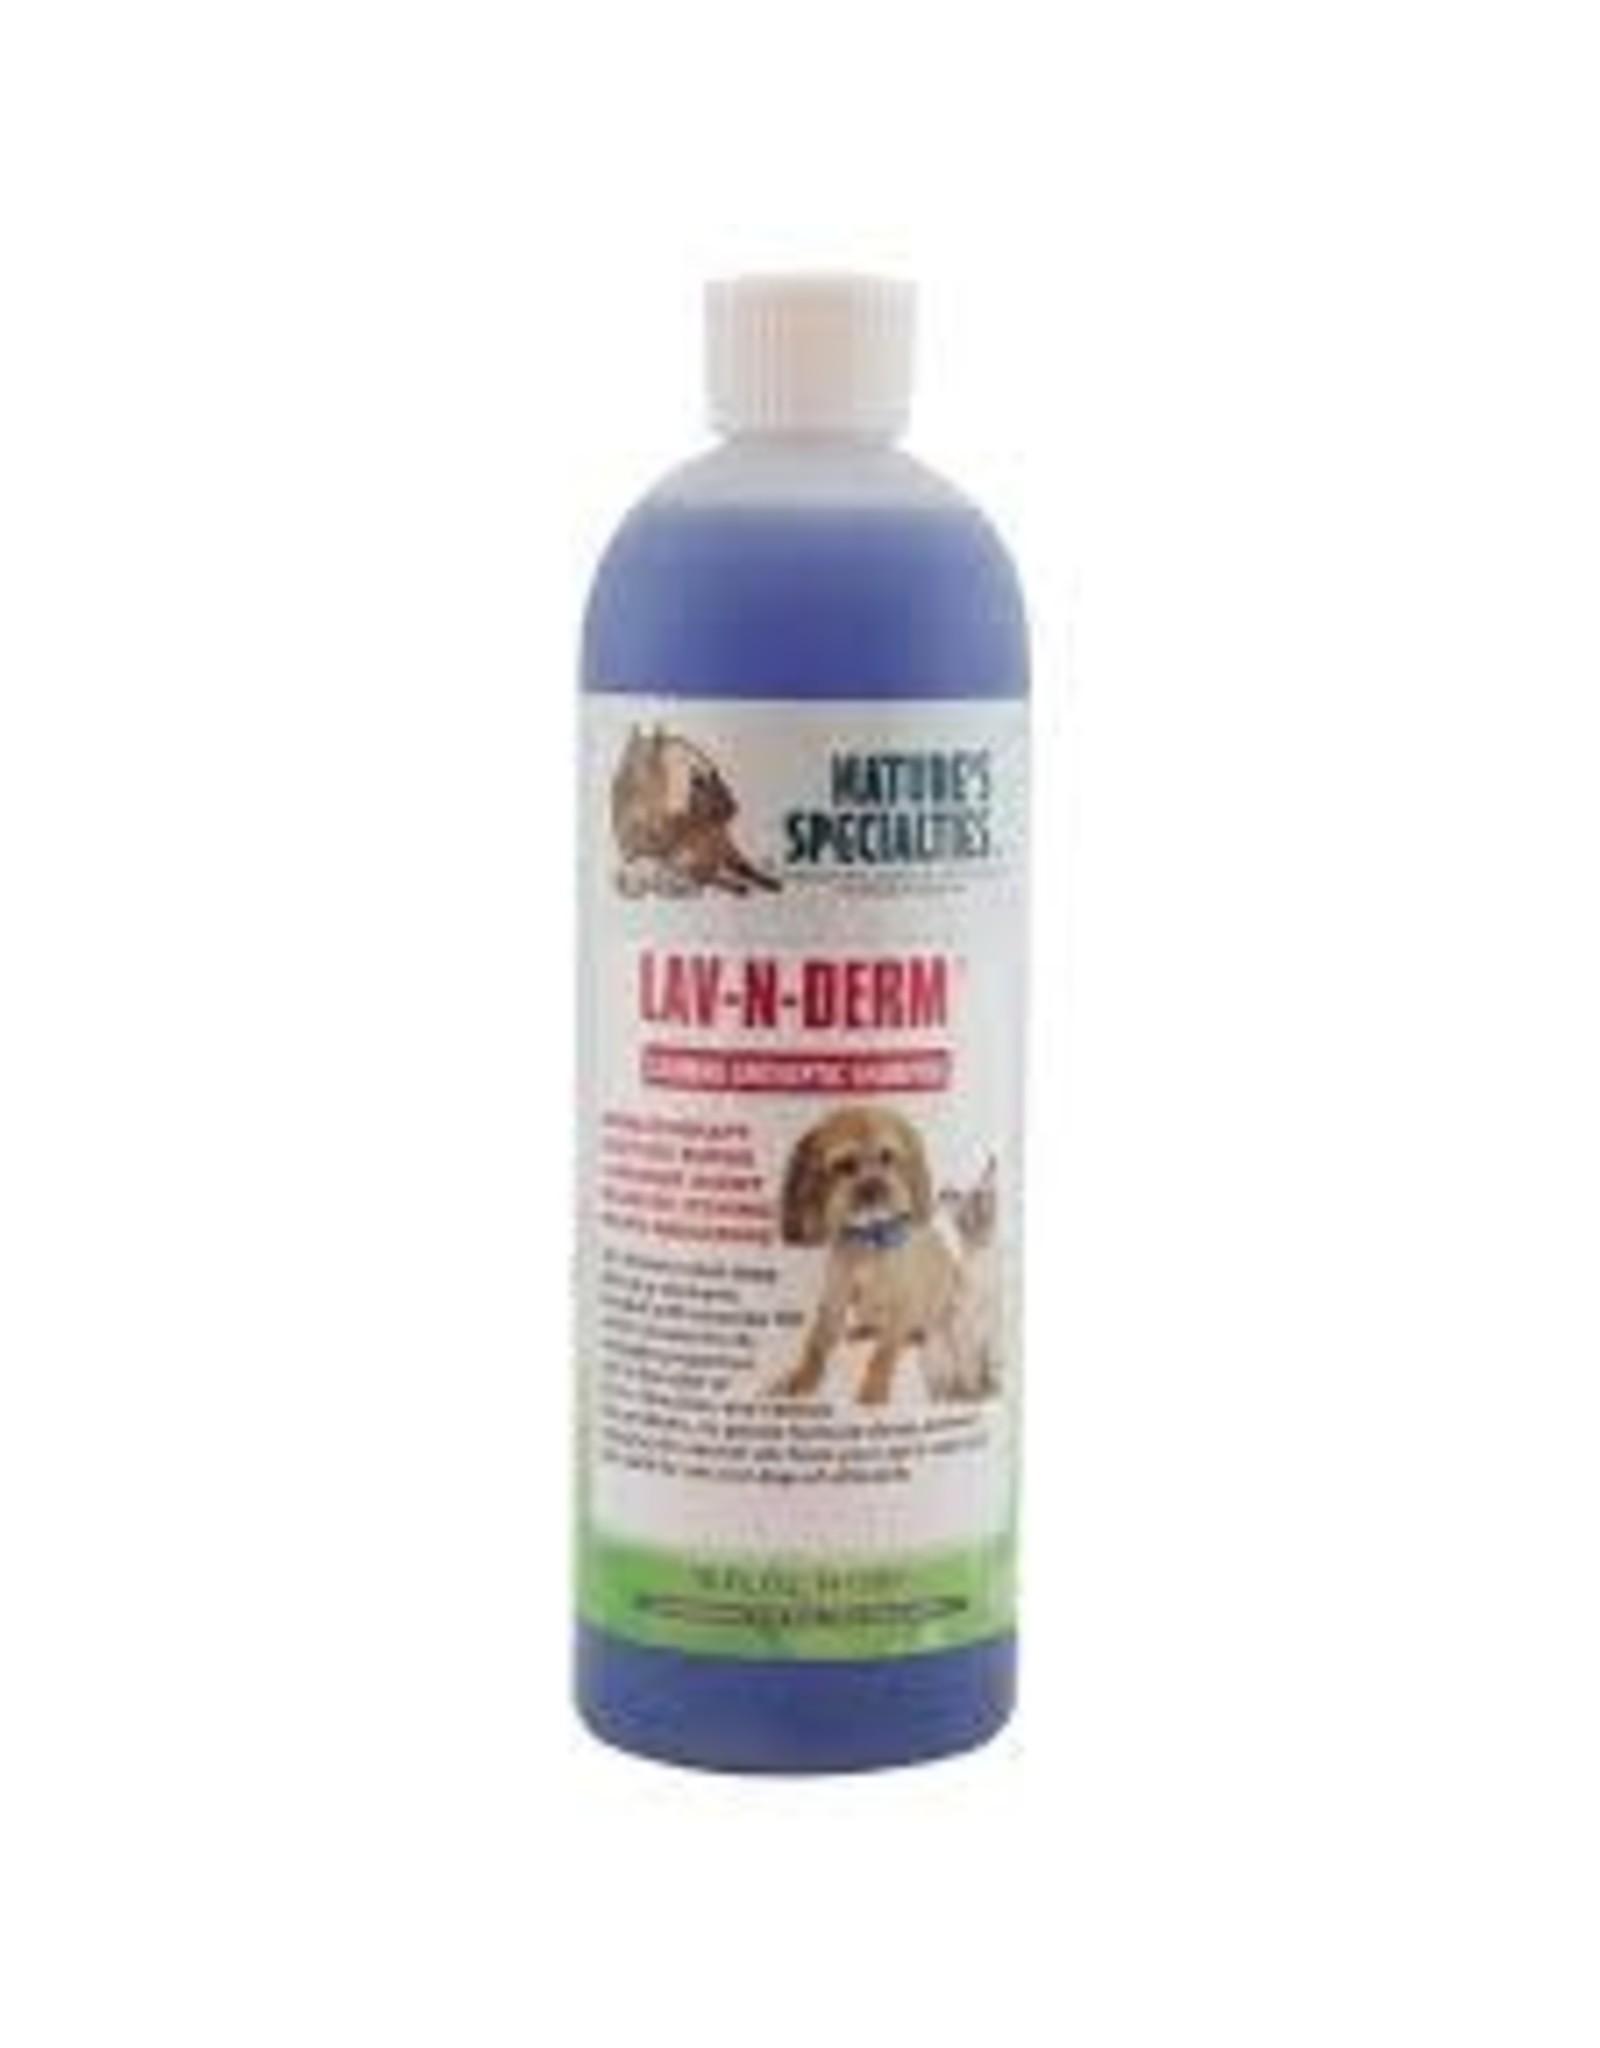 Nature's Specialty Lav N' Derm Shampoo - 16oz